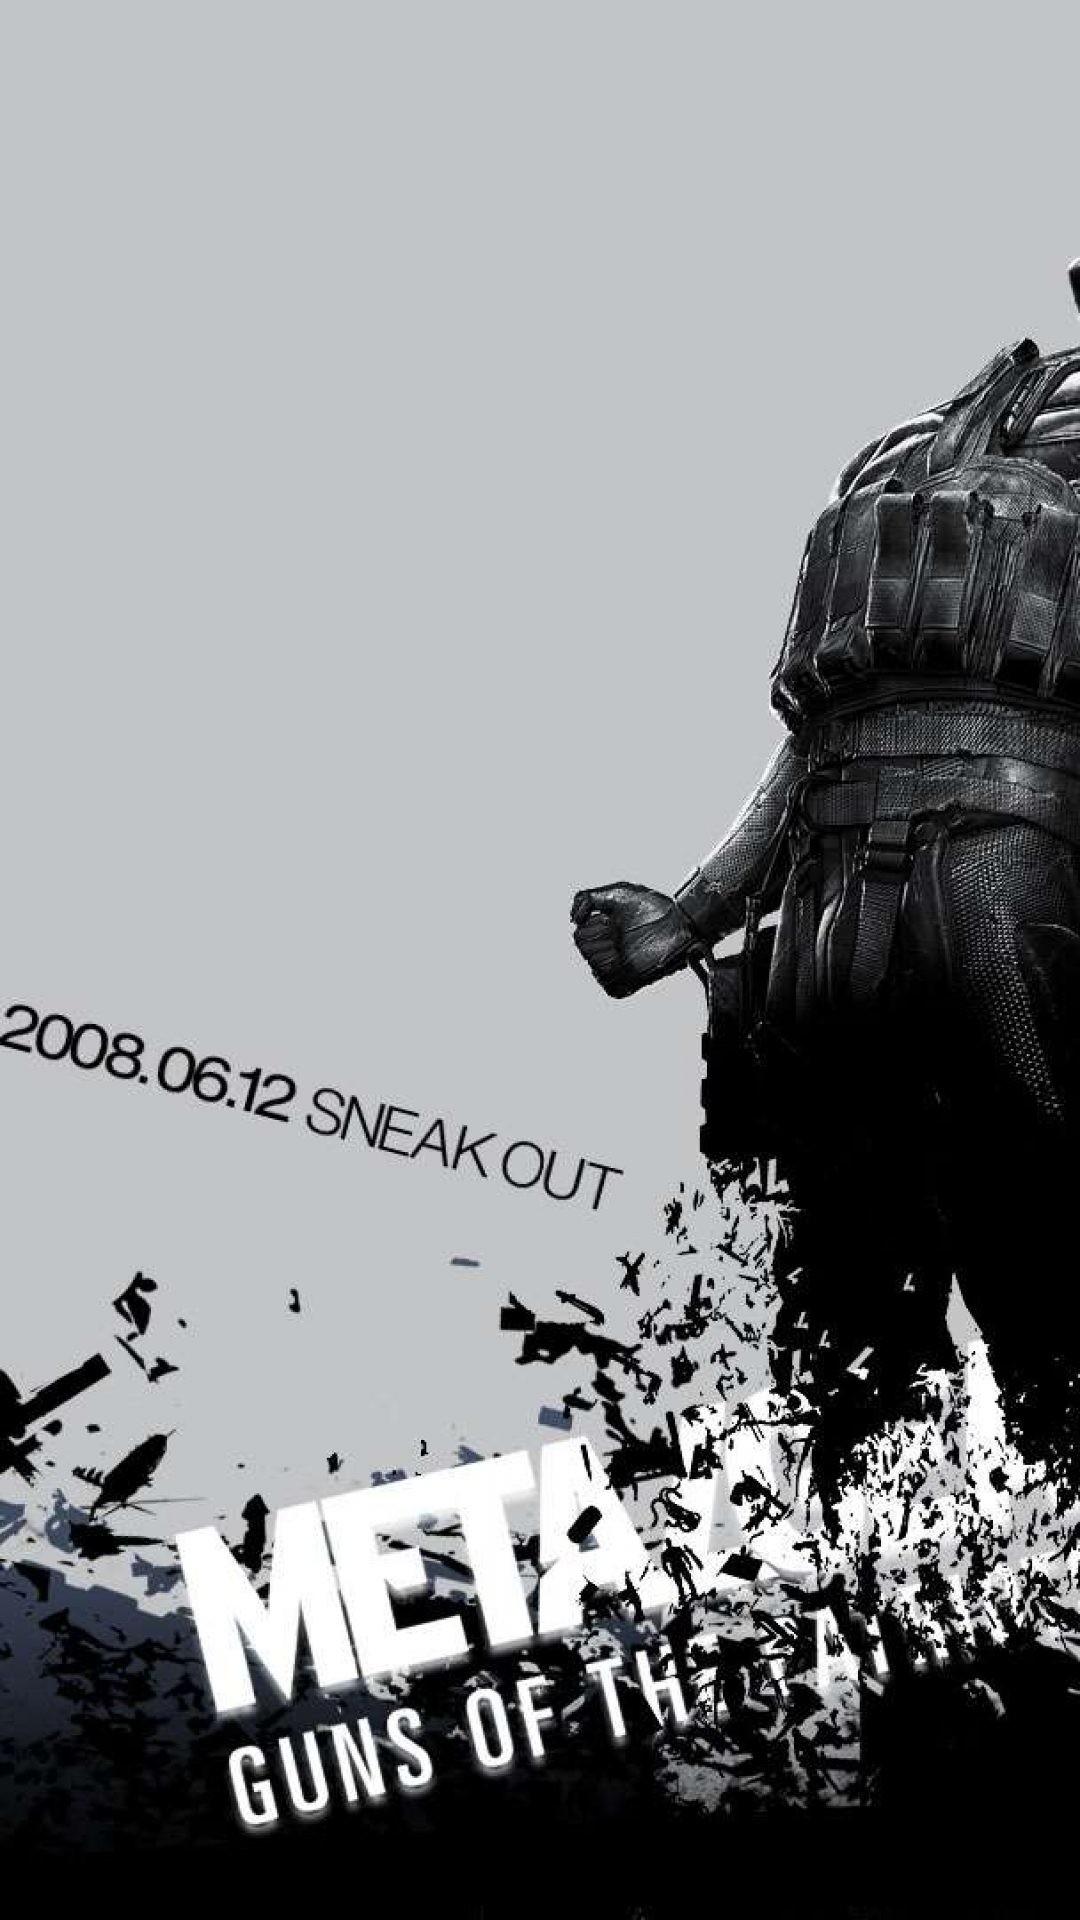 Metal Gear Solid Wallpaper Hd